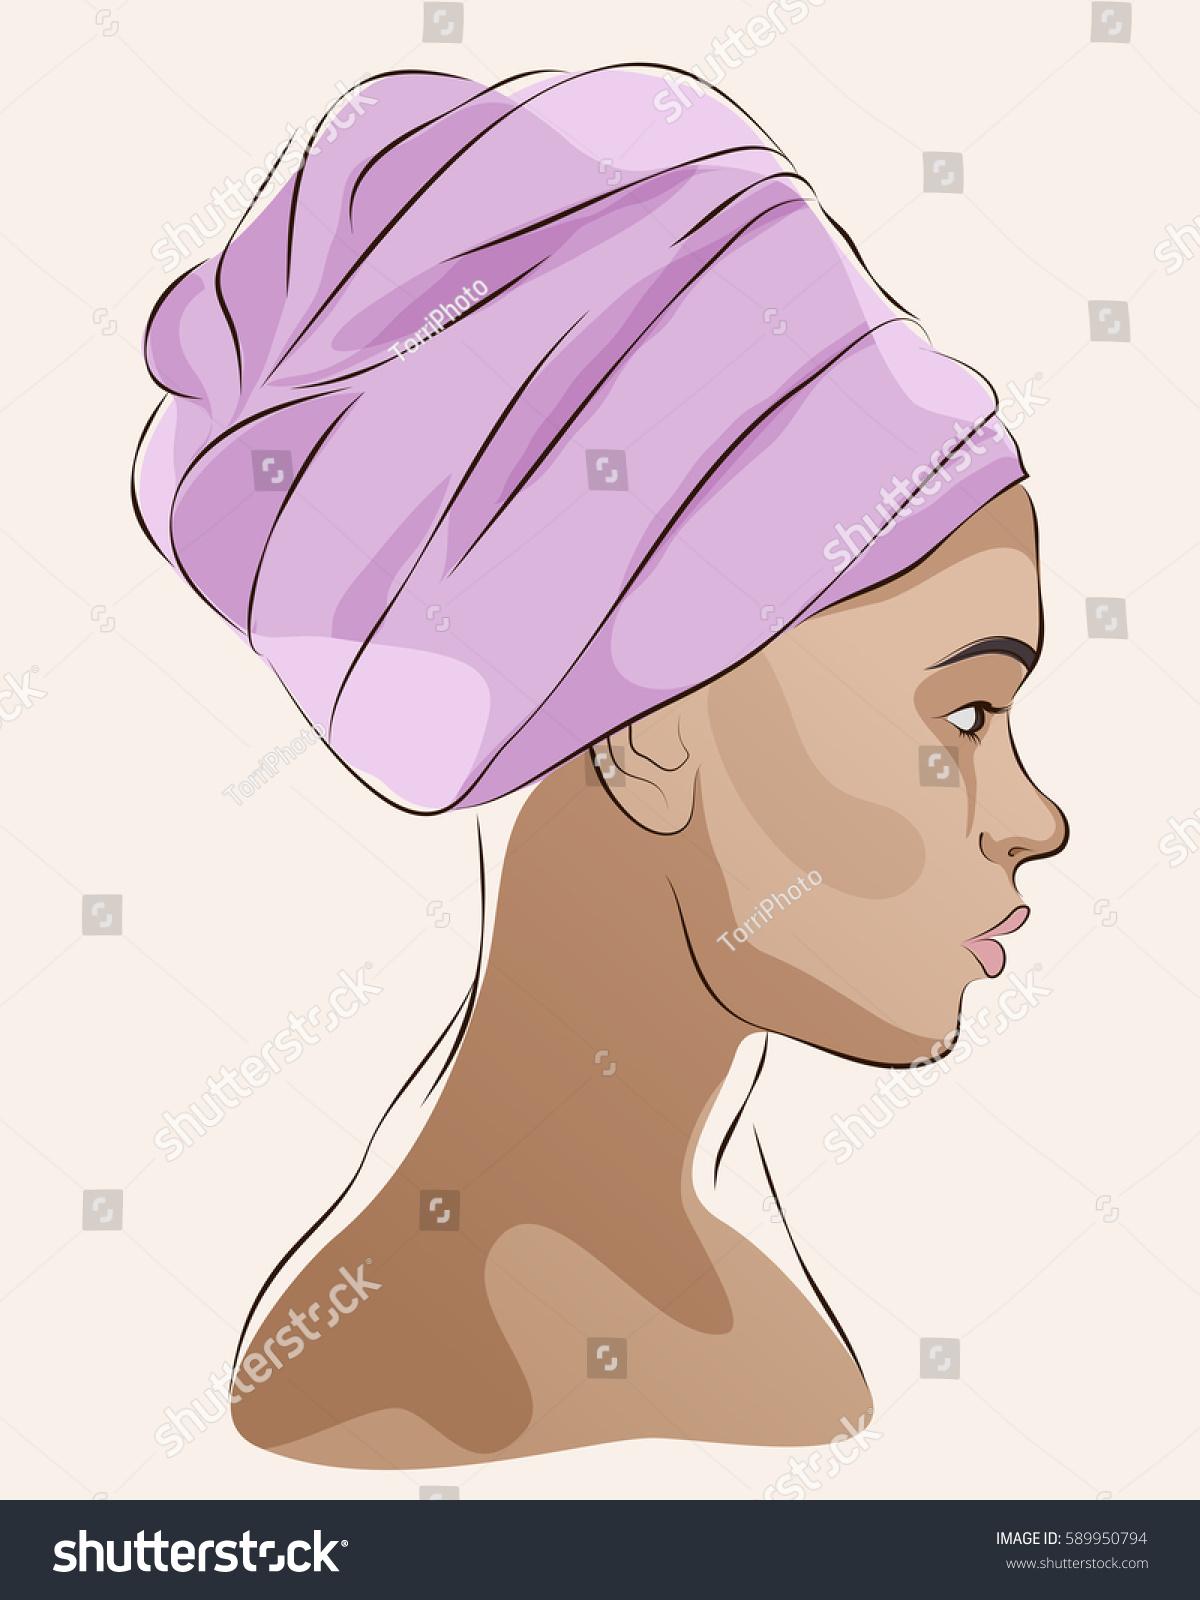 https://www.shutterstock.com/image-vector/profile-portrait-african-american-woman-turban-589950794